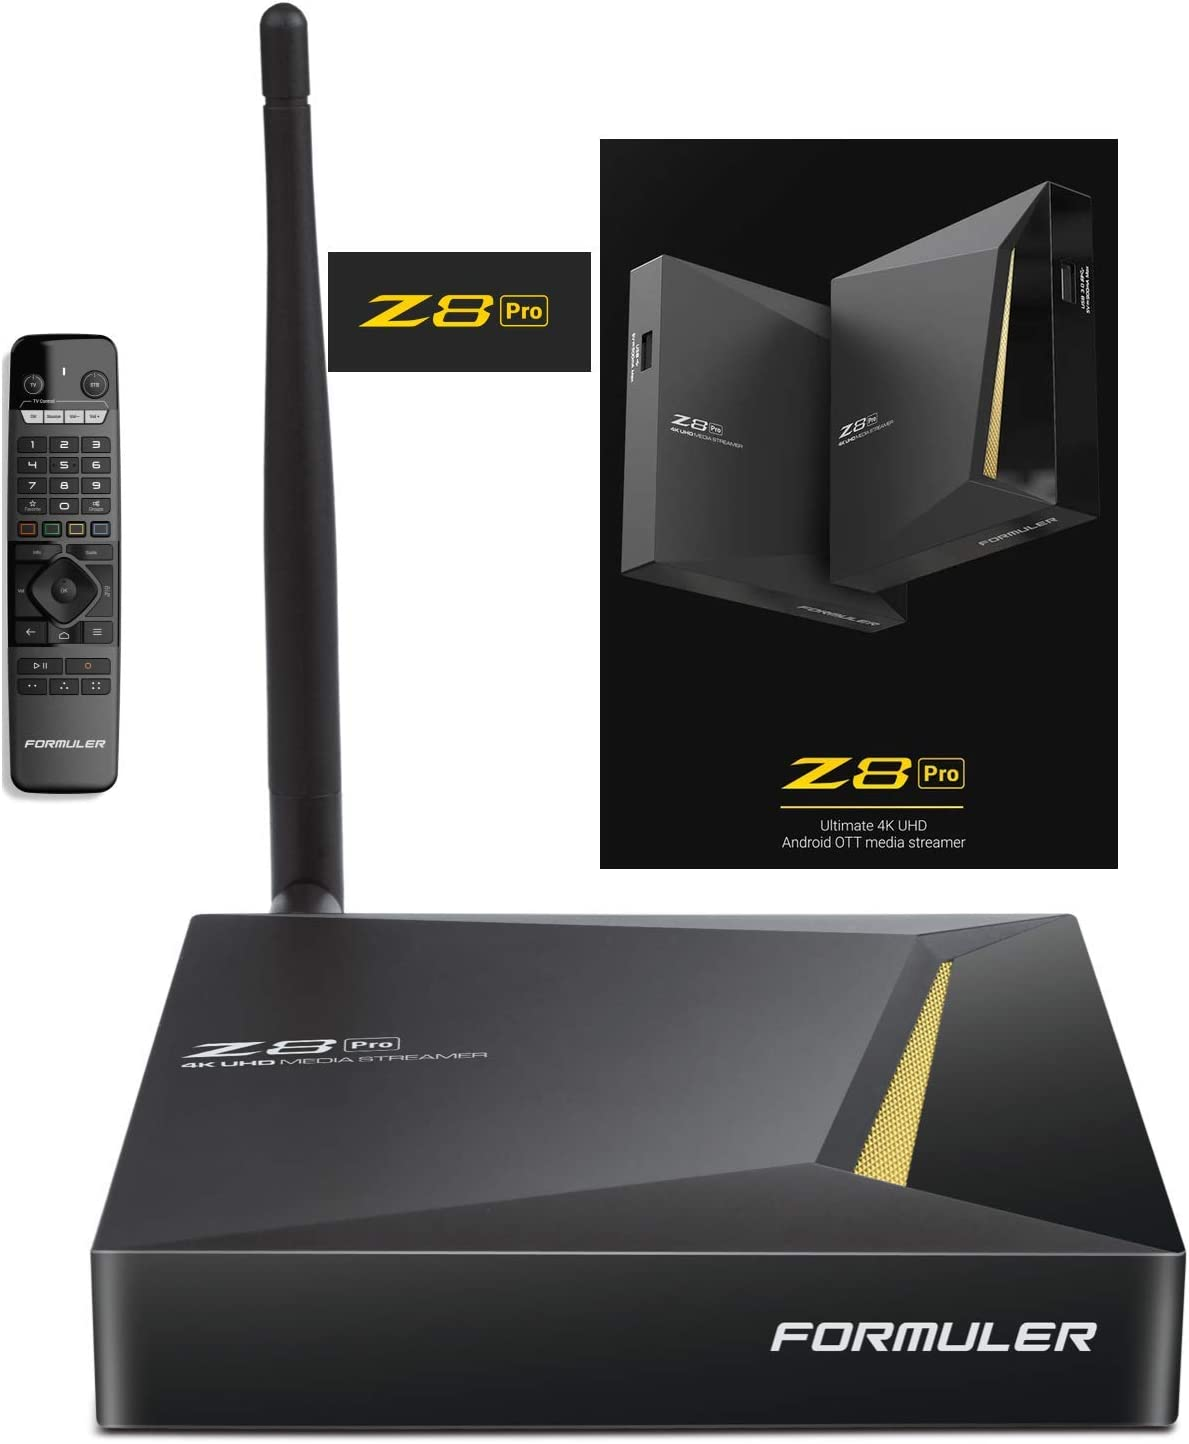 FORMULER Z8 Pro Android Dual Band 5G Gigabit LAN 2GB RAM 16GB ROM 4K Smart Learning Remote with IR